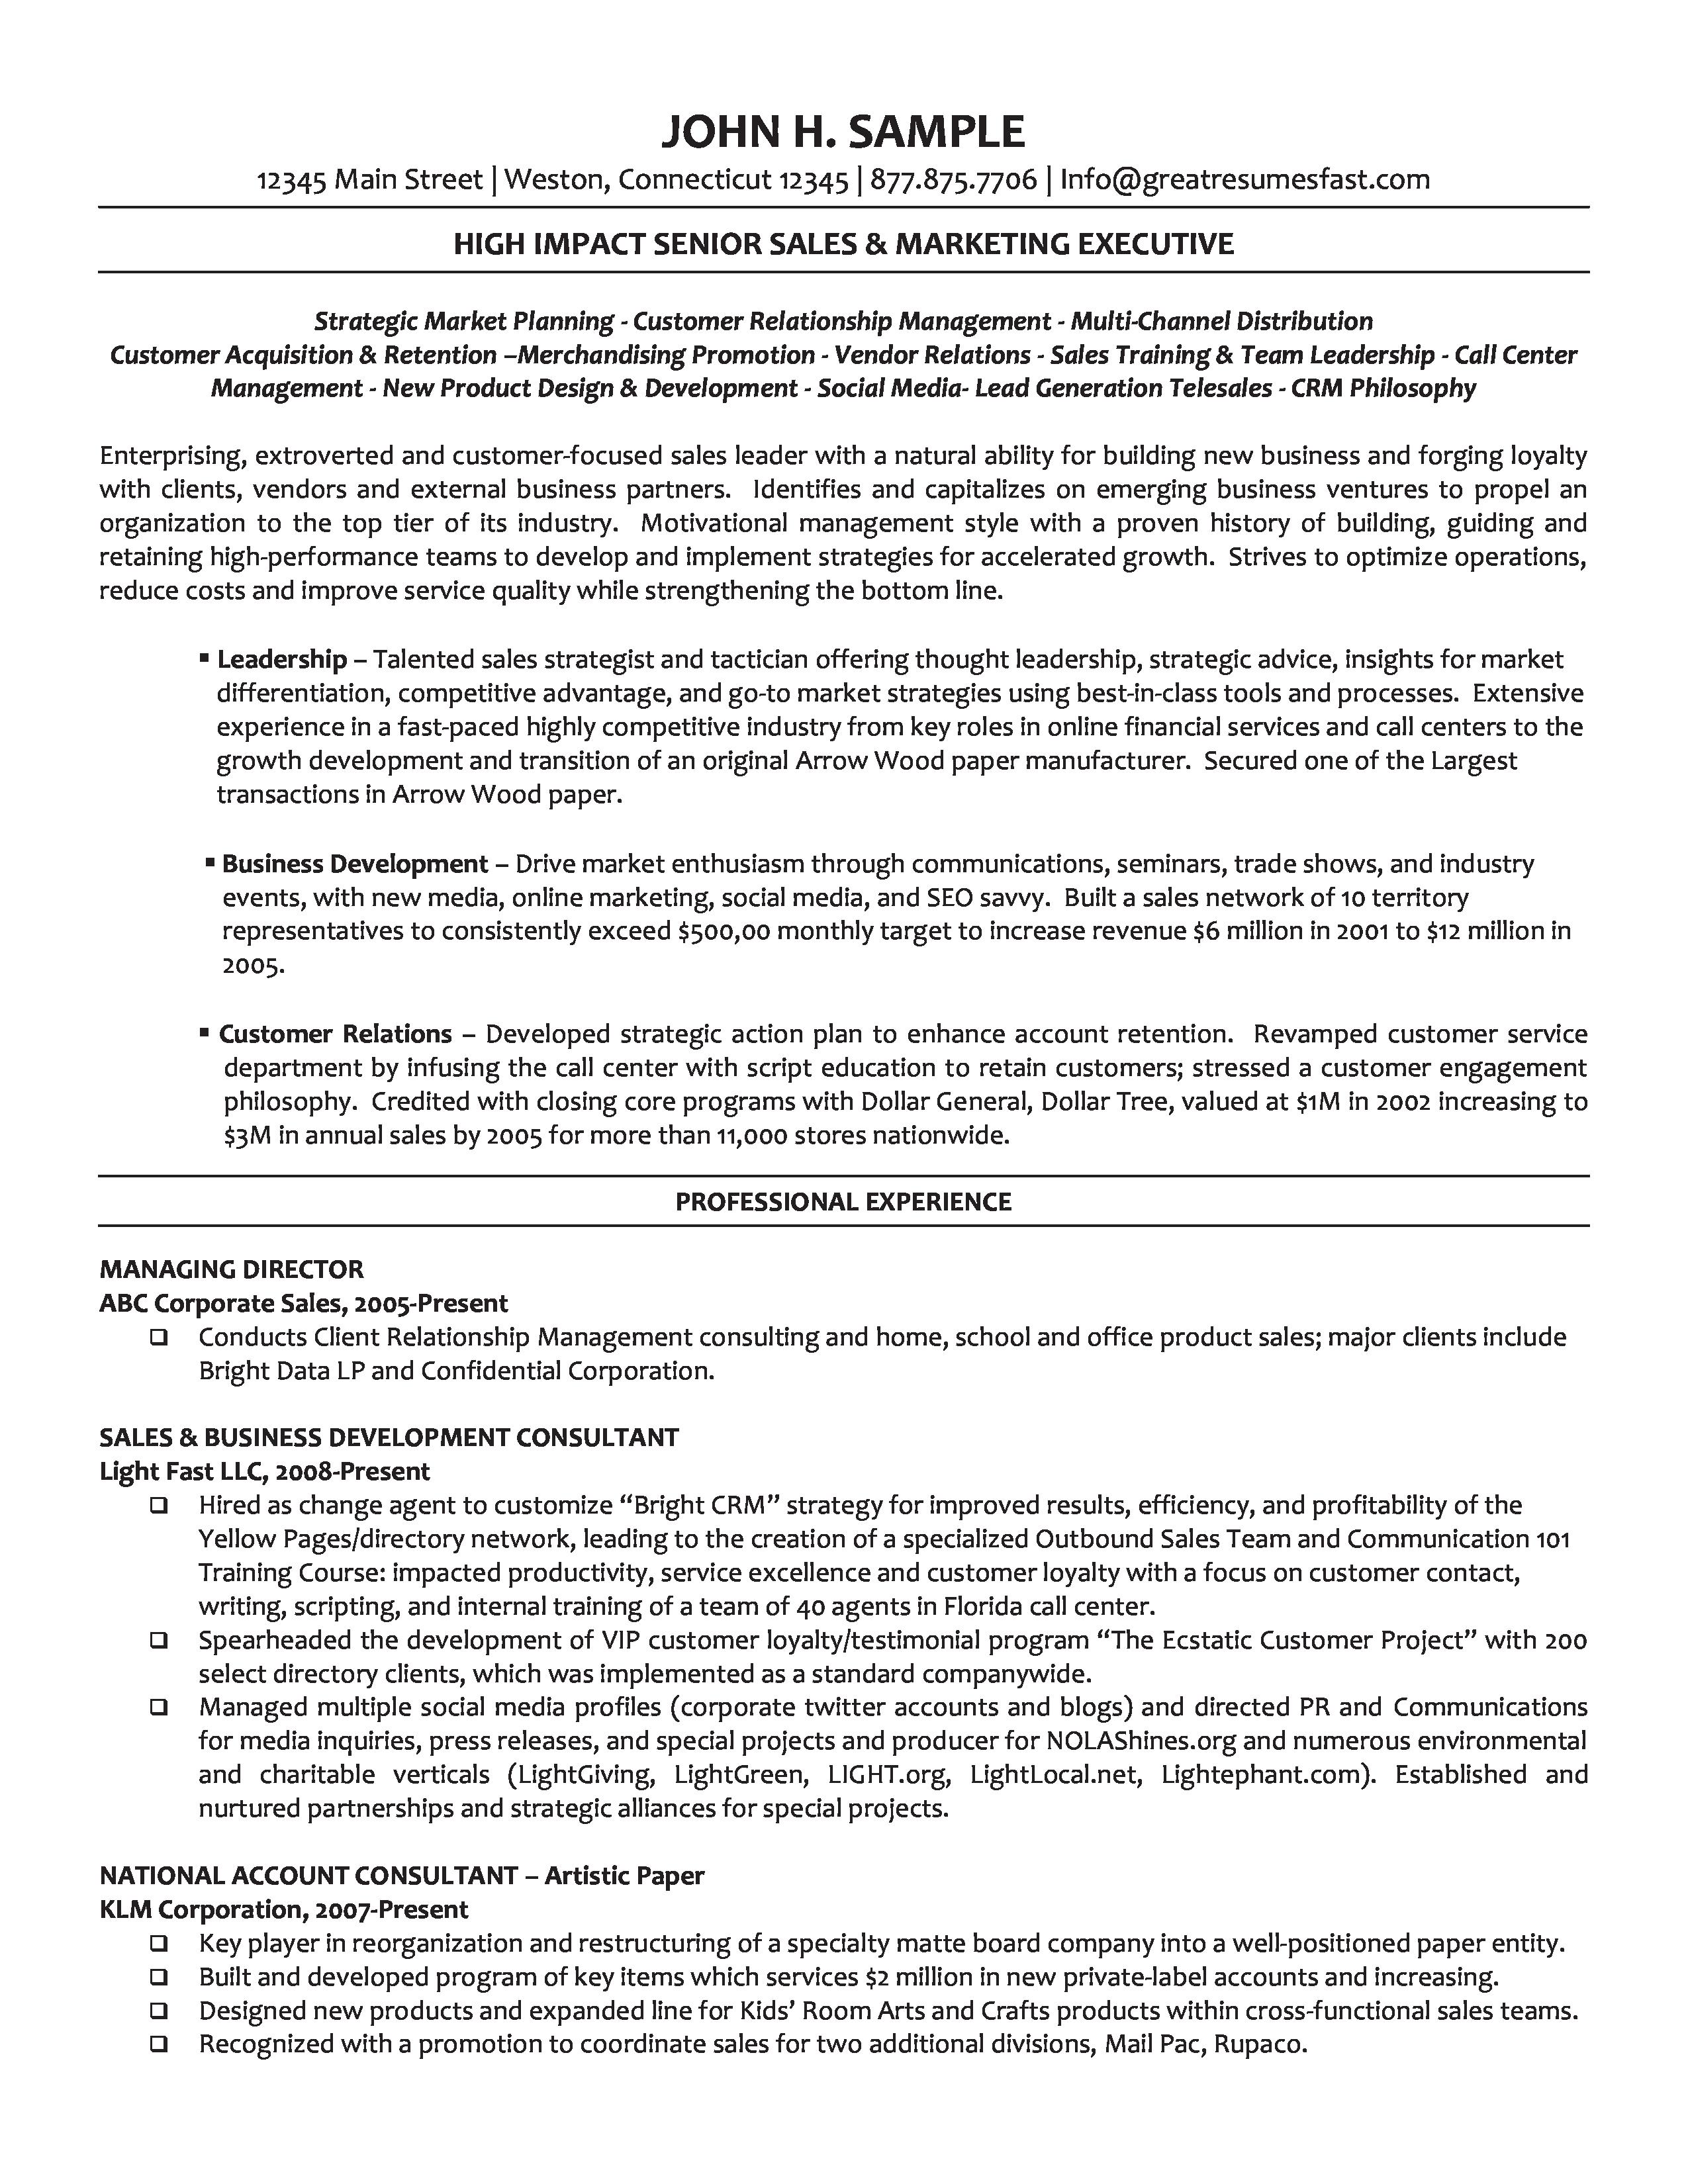 Executive Managing Director How To Draft An Executive Managing Dire Teaching Philosophy Statement Examples Teaching Philosophy Statement Action Plan Template